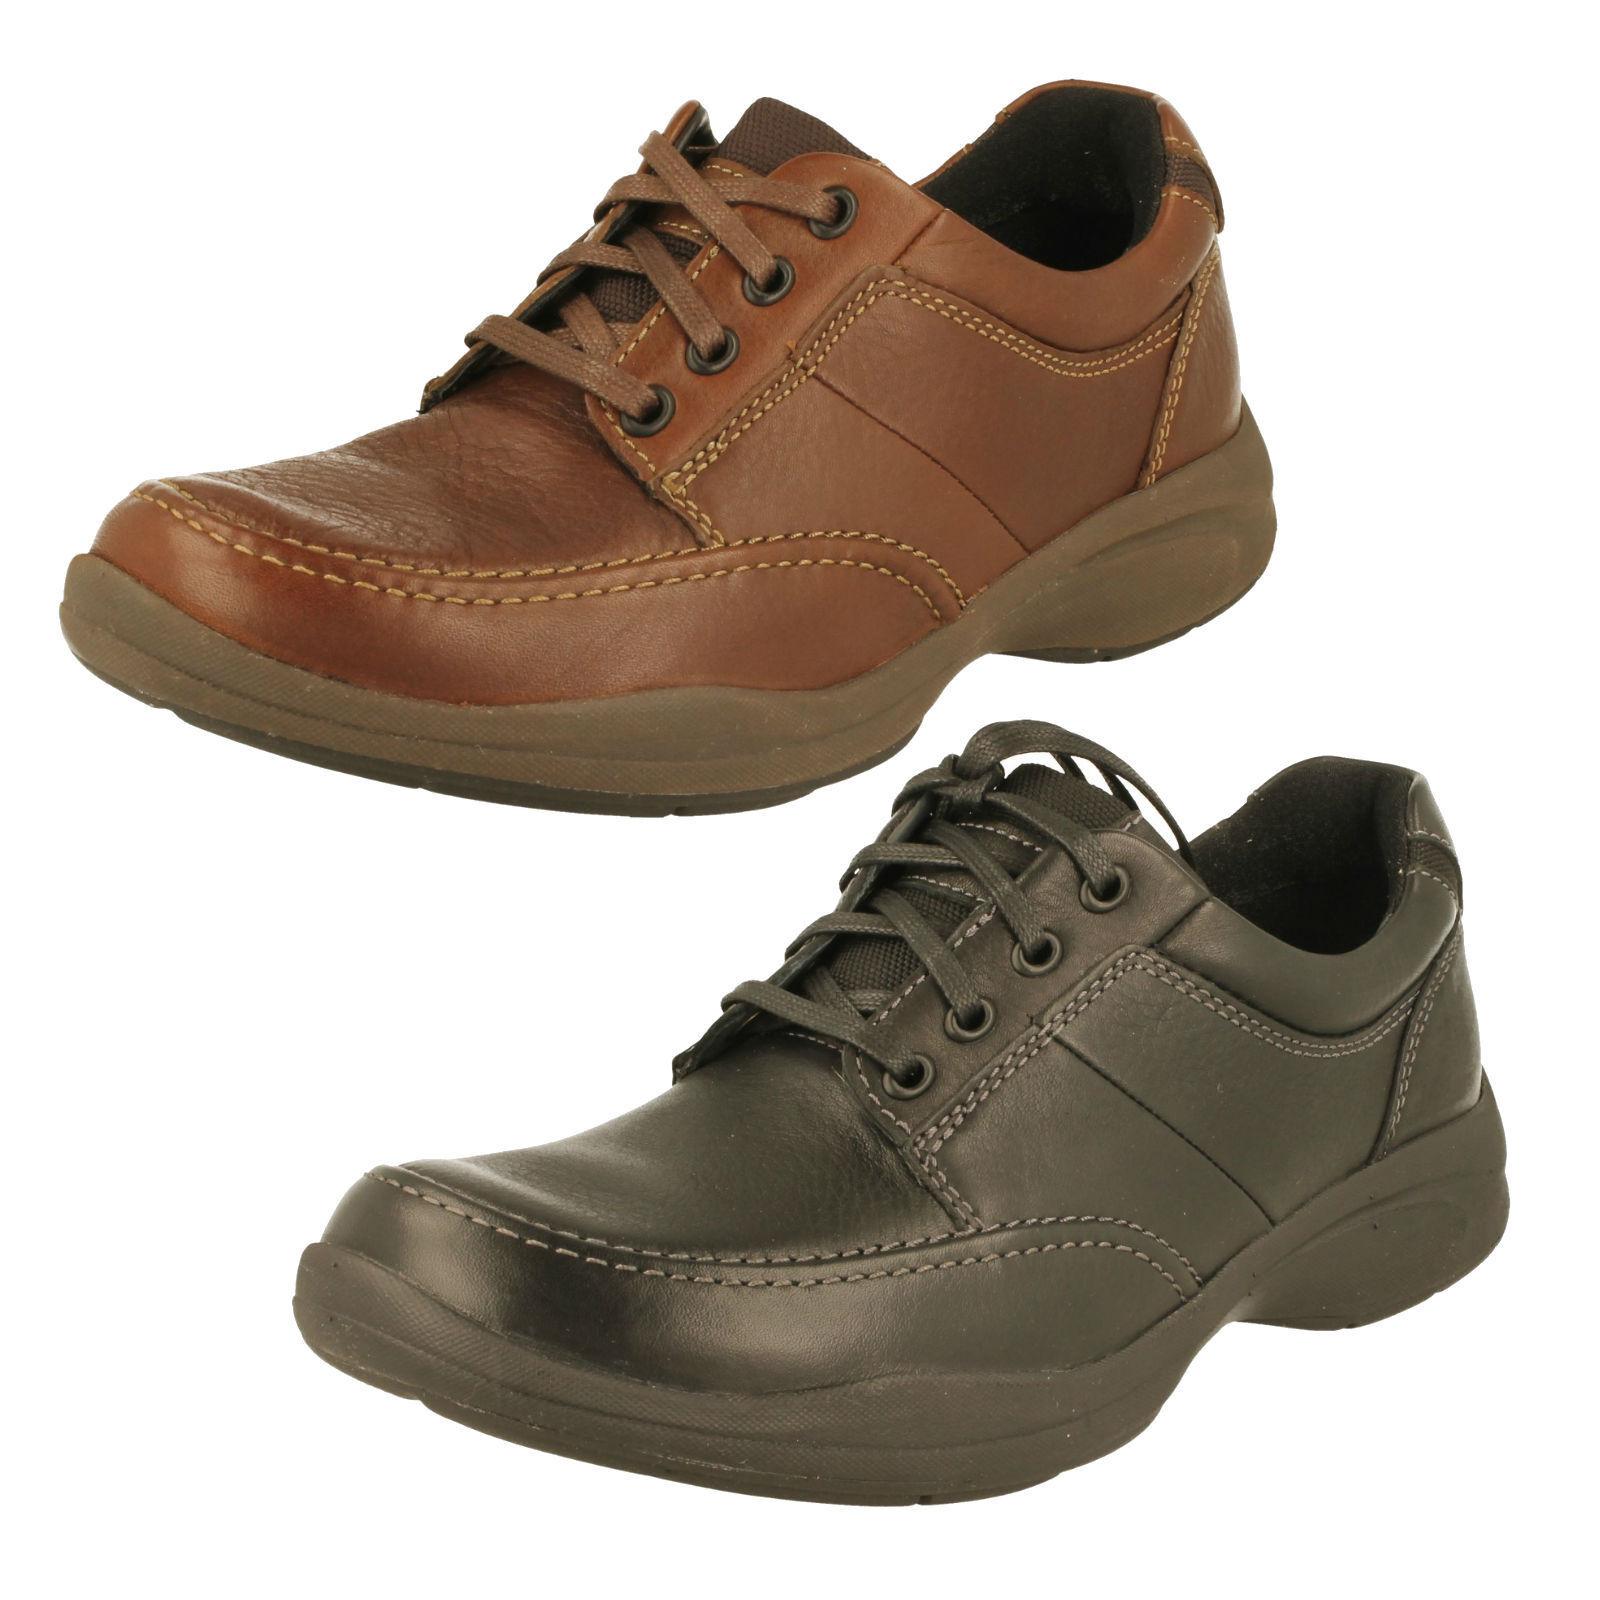 Men's Clarks Casual Lace Up Shoes - Wavekorey Mix G Fit